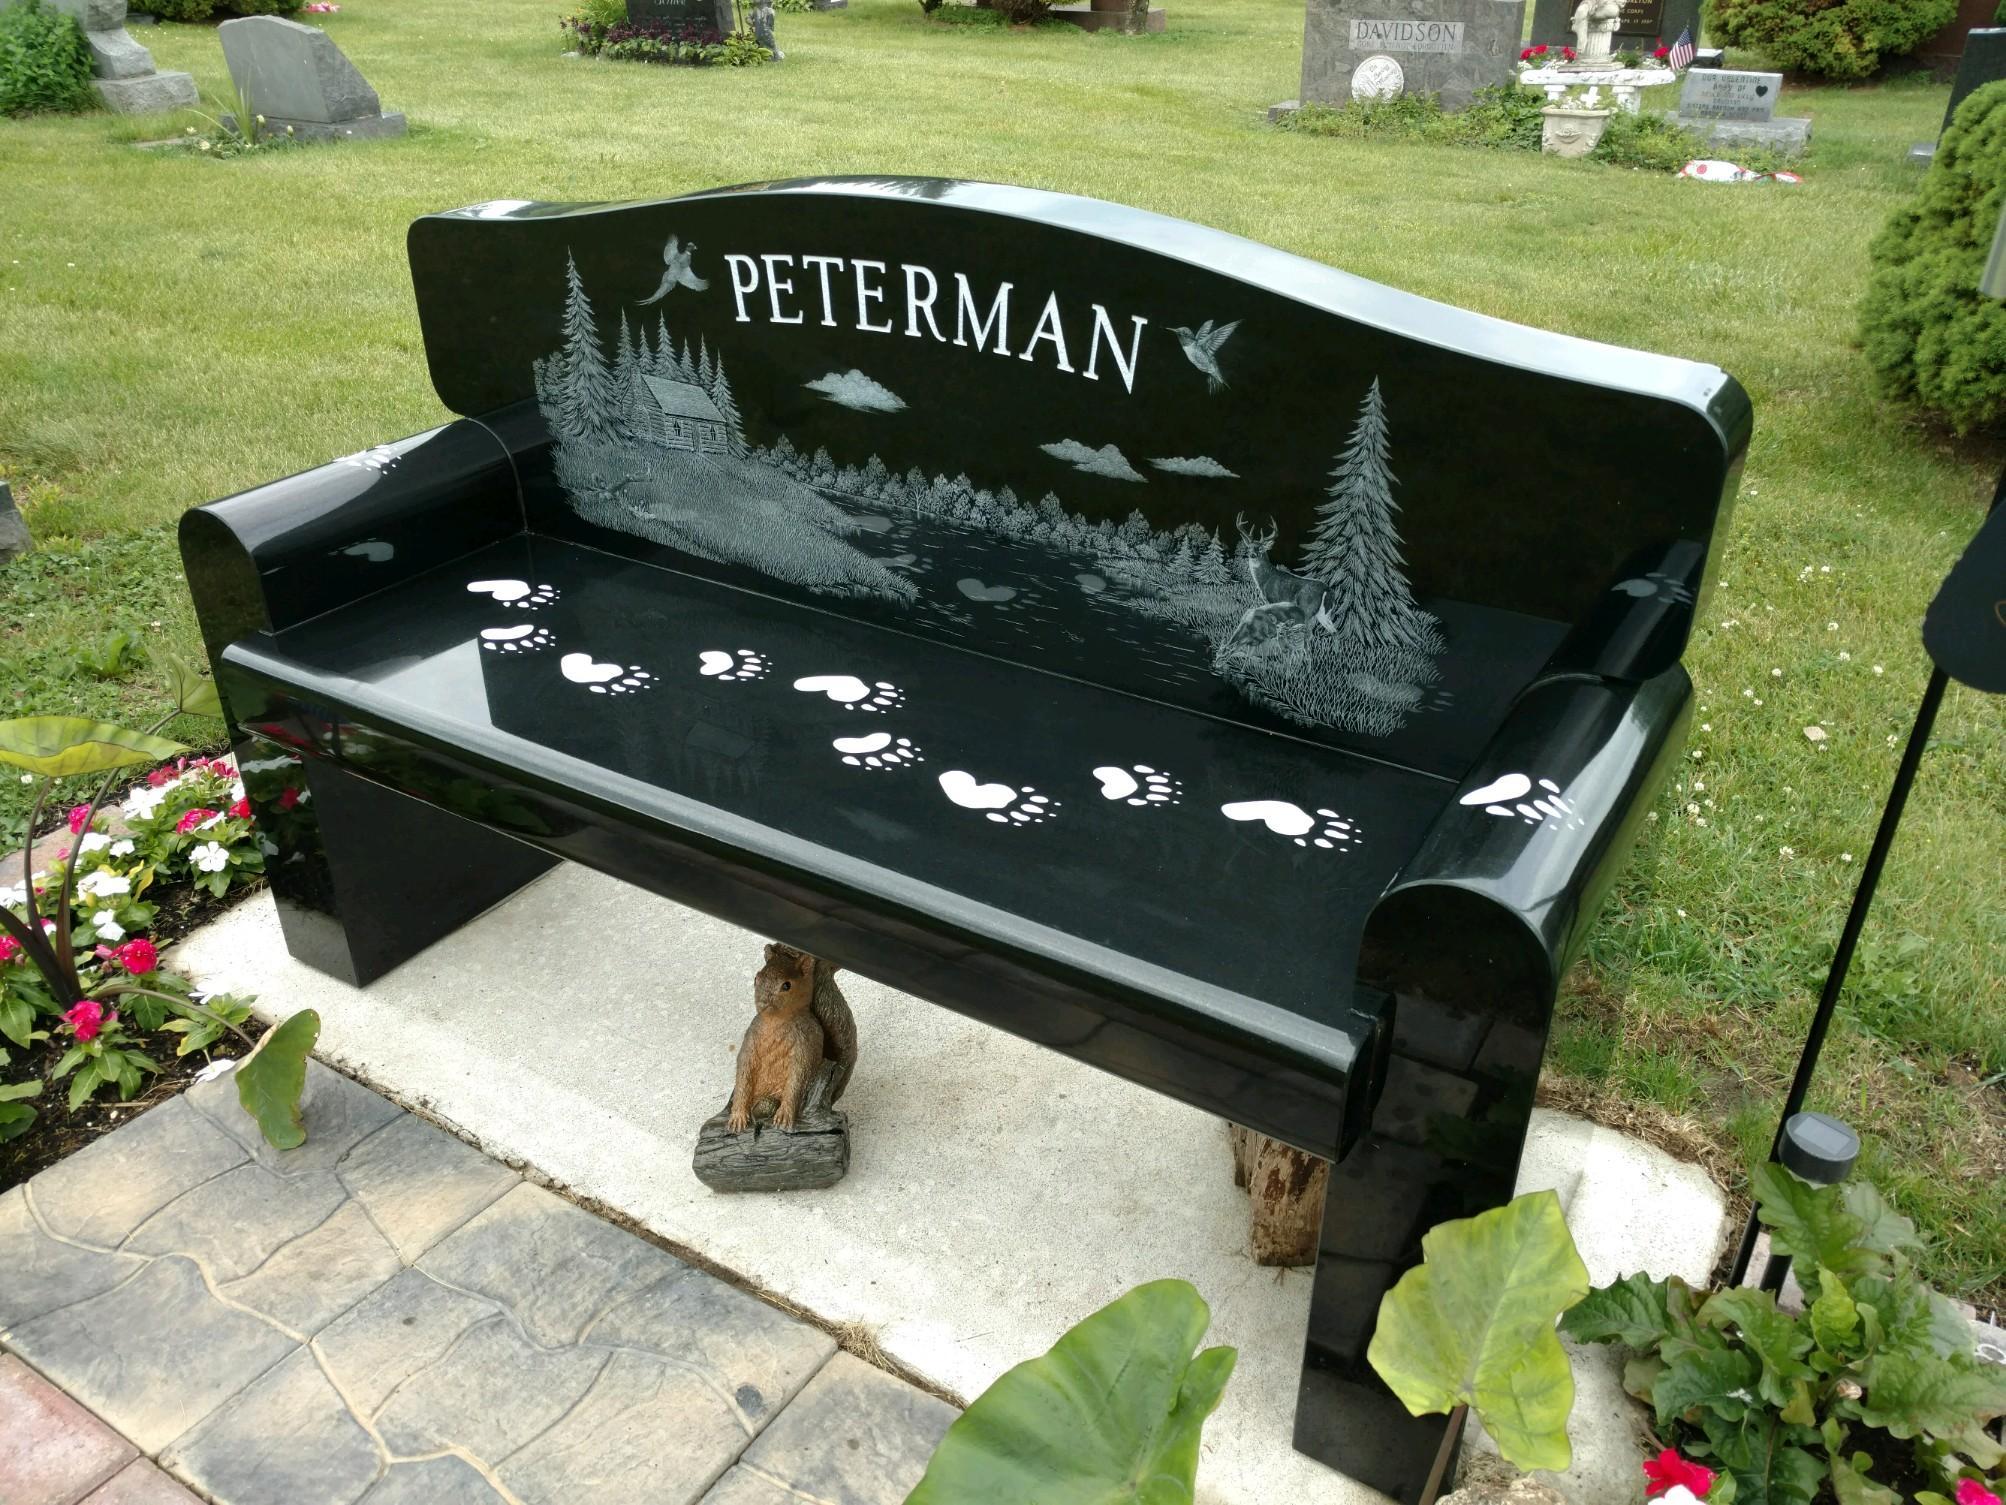 Peterman Bench Front